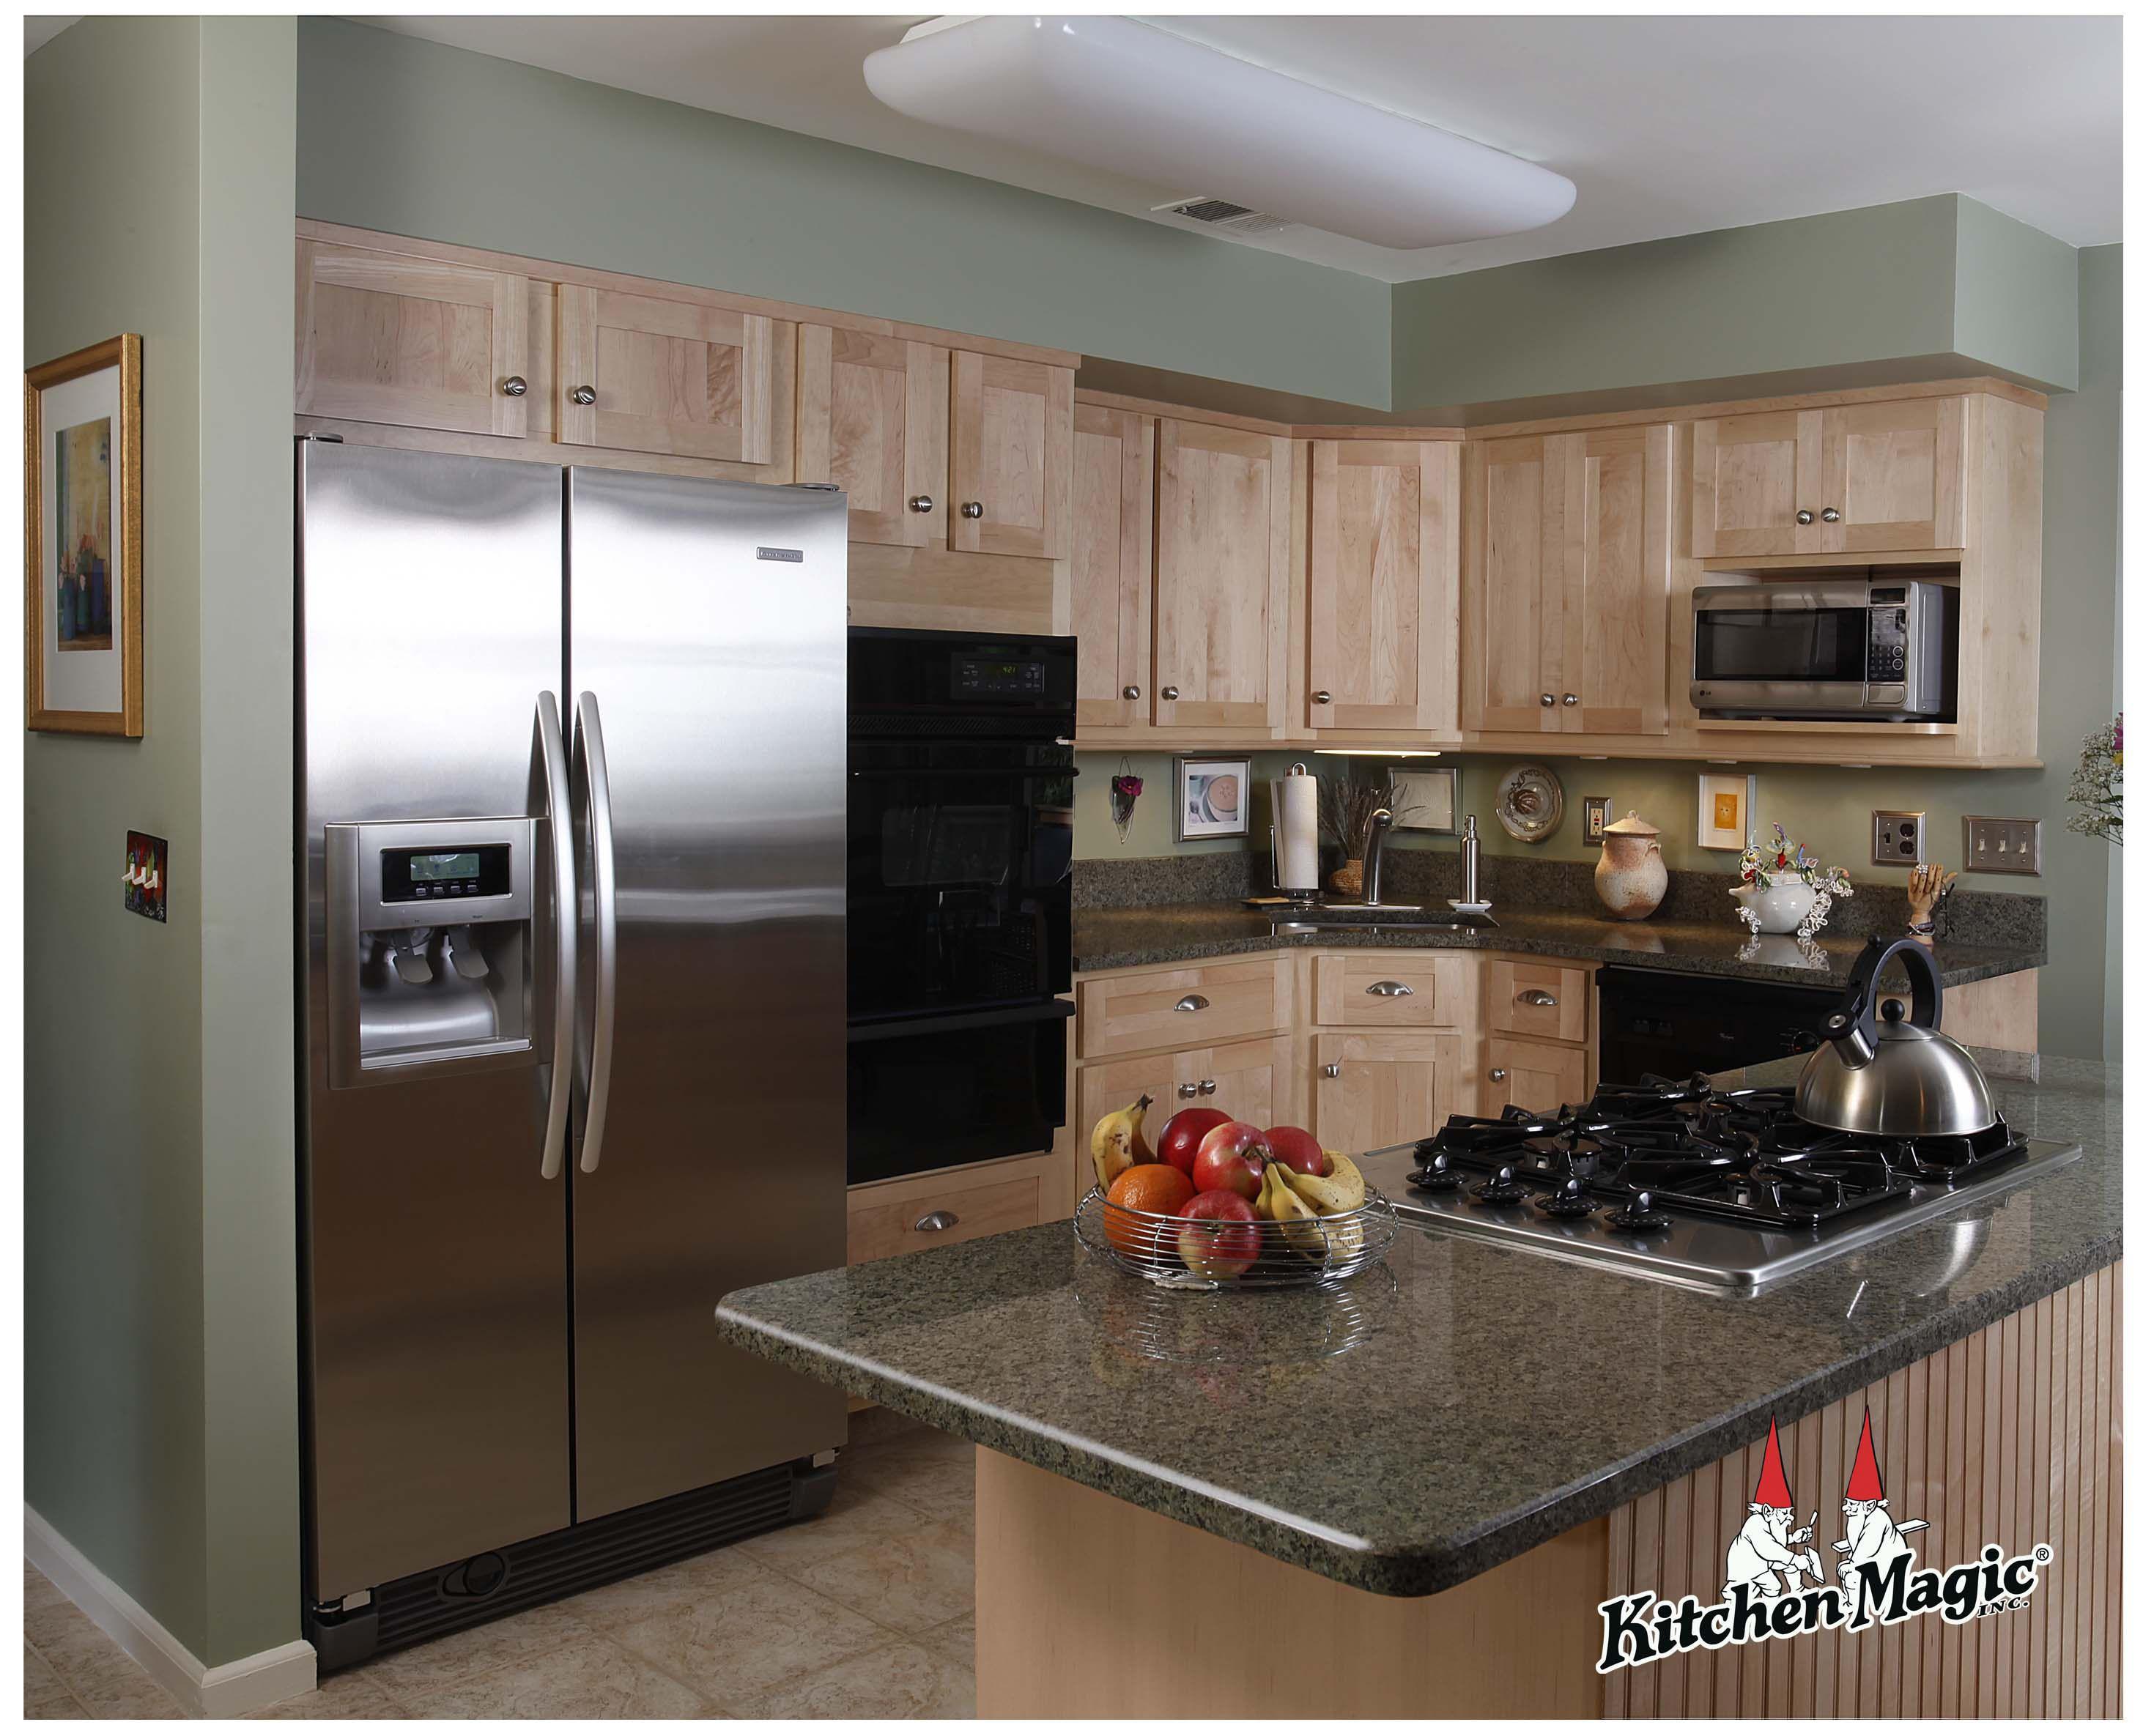 Natural Maple Wood Cabinets. Granite Countertop ... on Maple Cabinets With Granite Countertops  id=13974